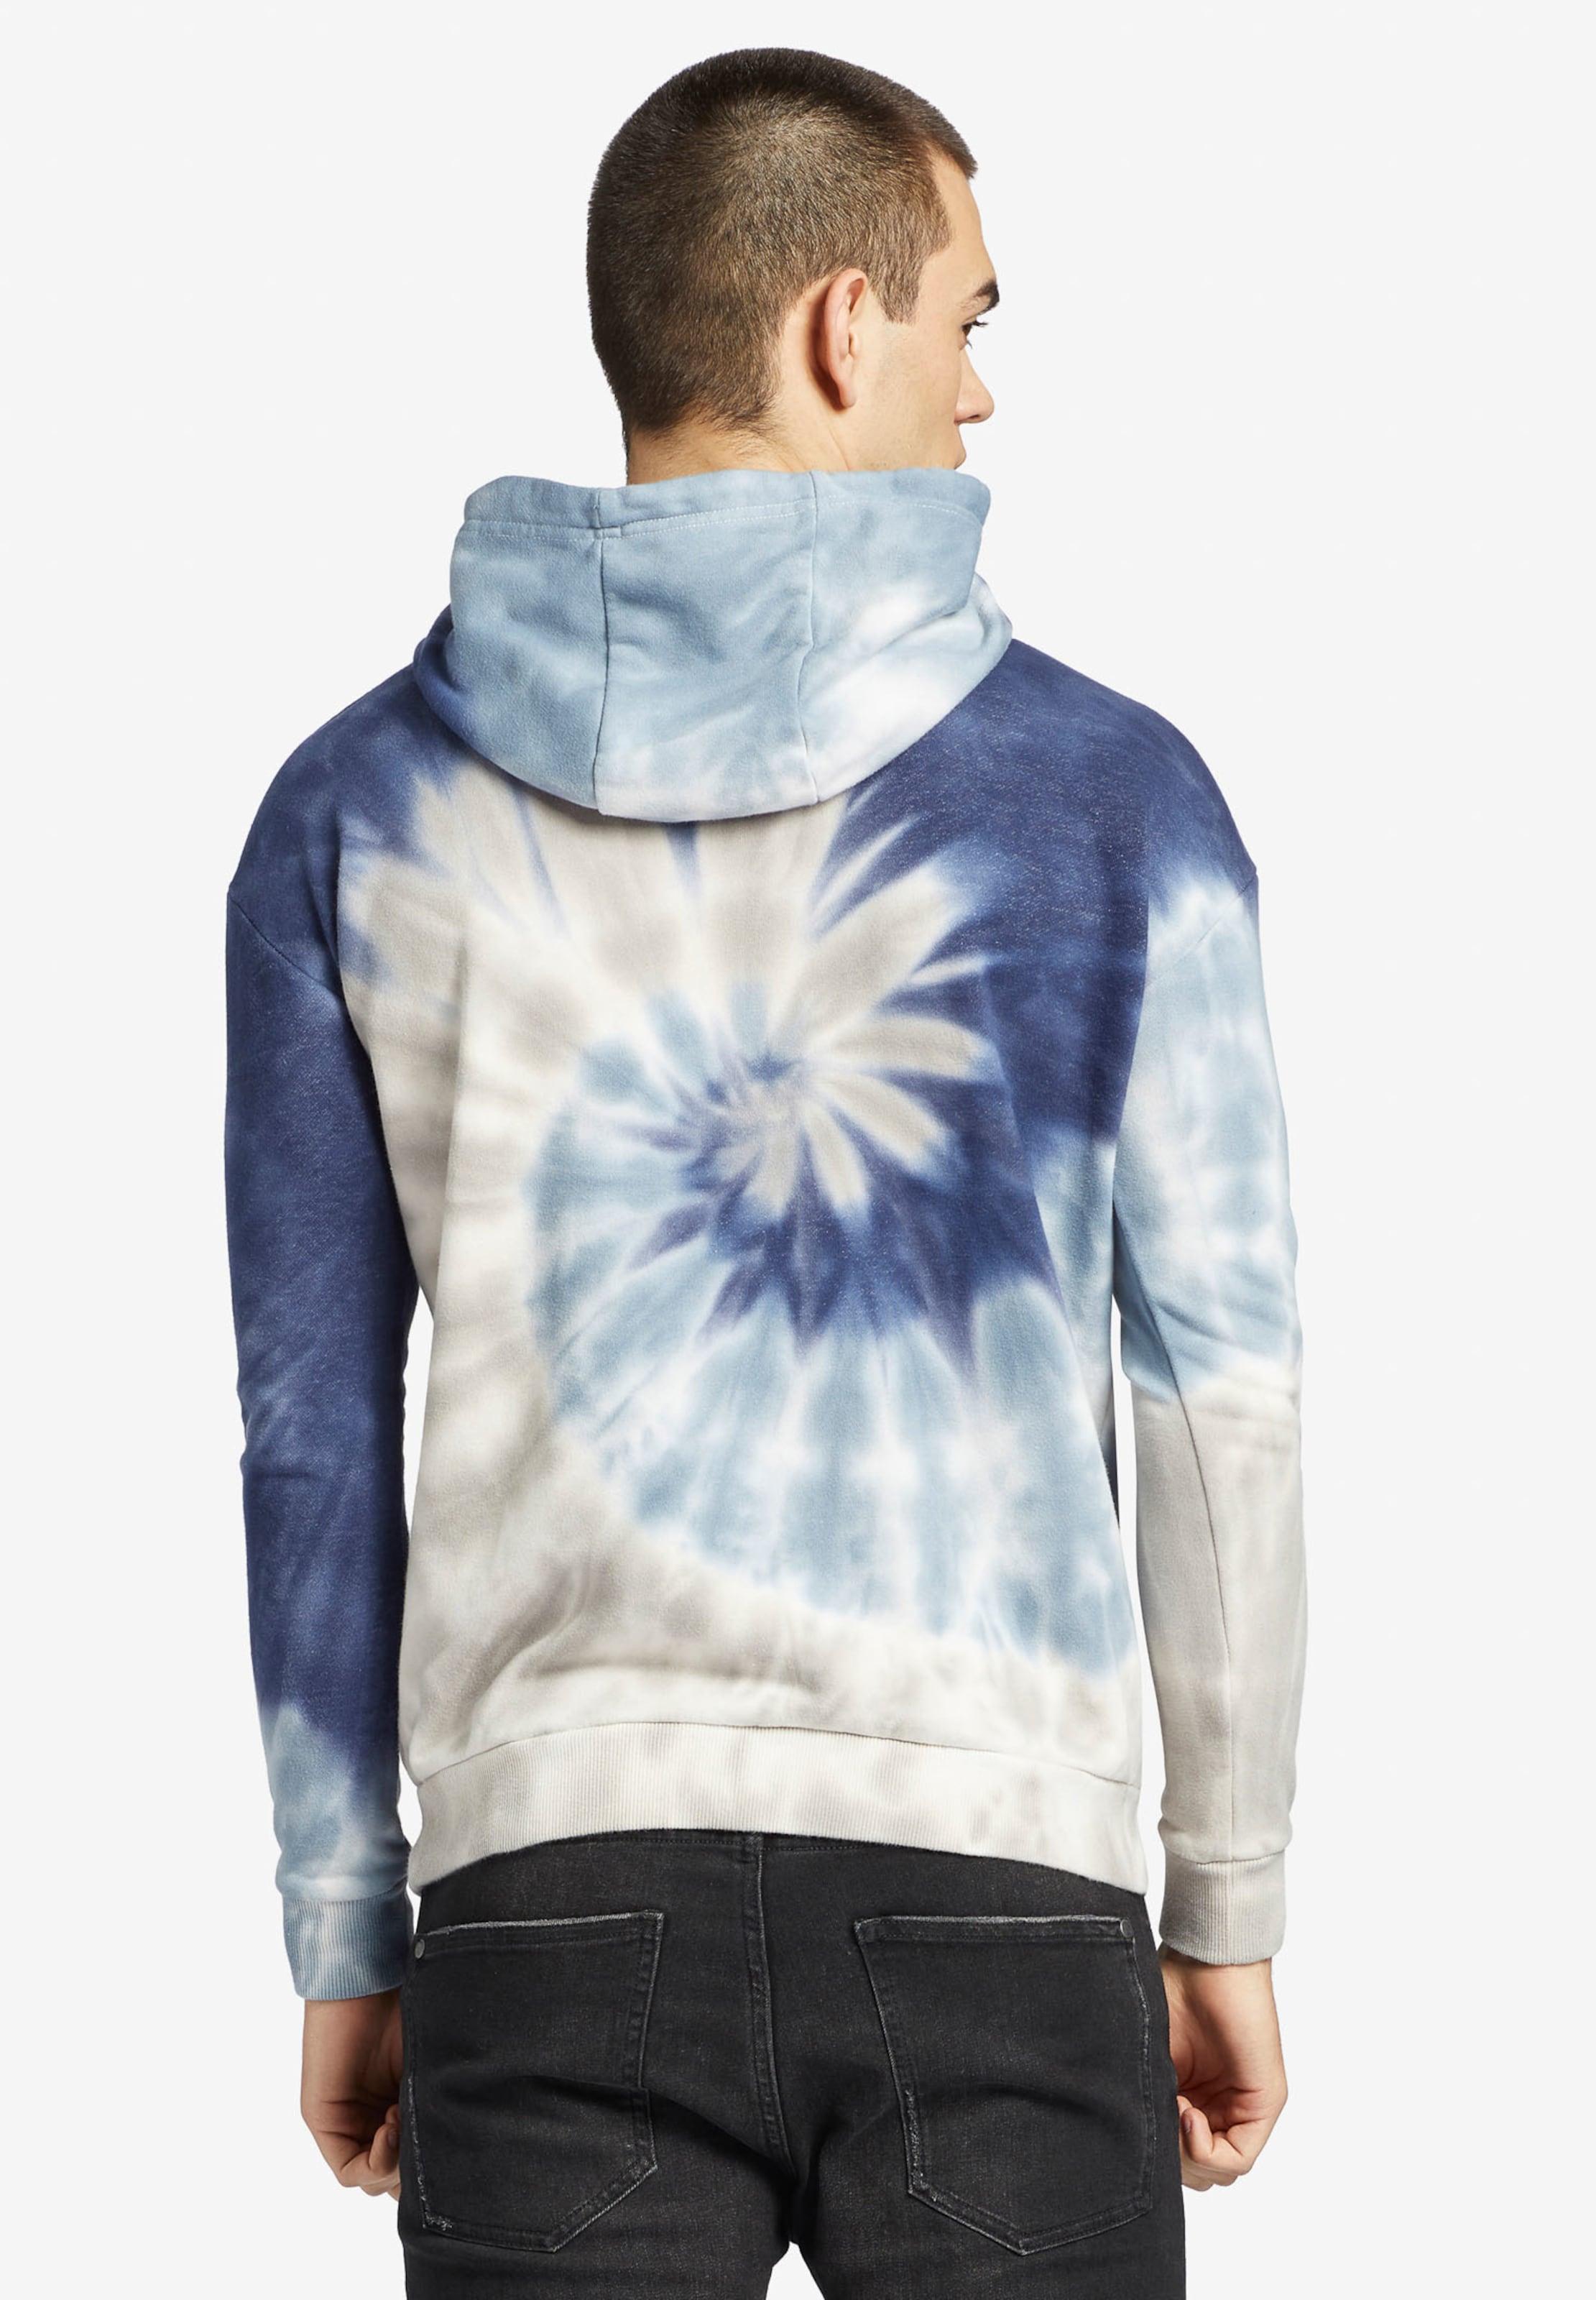 Sweatshirt In Perlweiß Khujo RauchblauRoyalblau Segal ' O80knwP